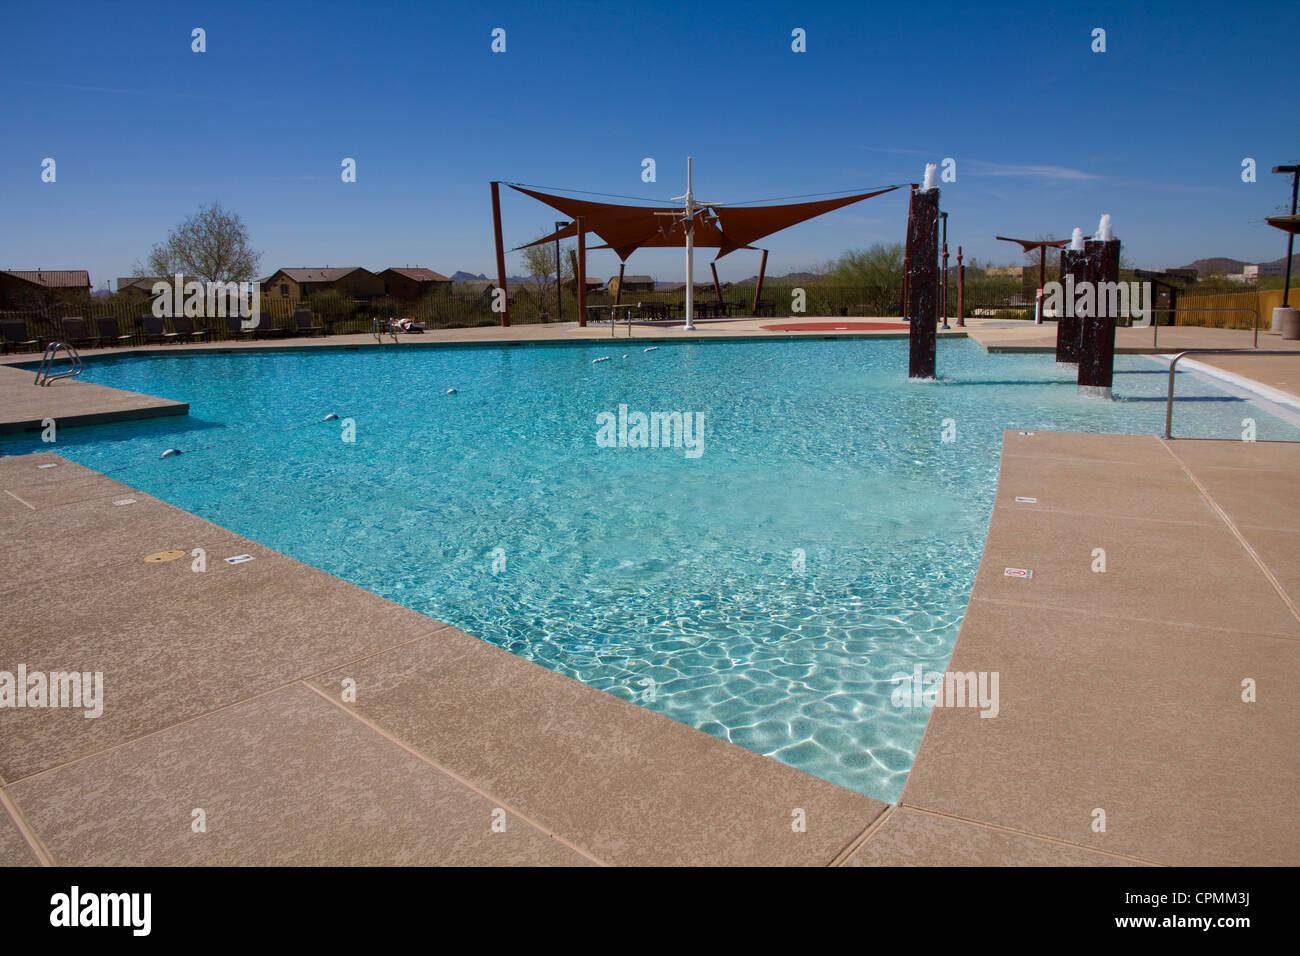 Pool area at Fireside at Desert Ridge, N. Scottsdale, AZ, USA. - Stock Image